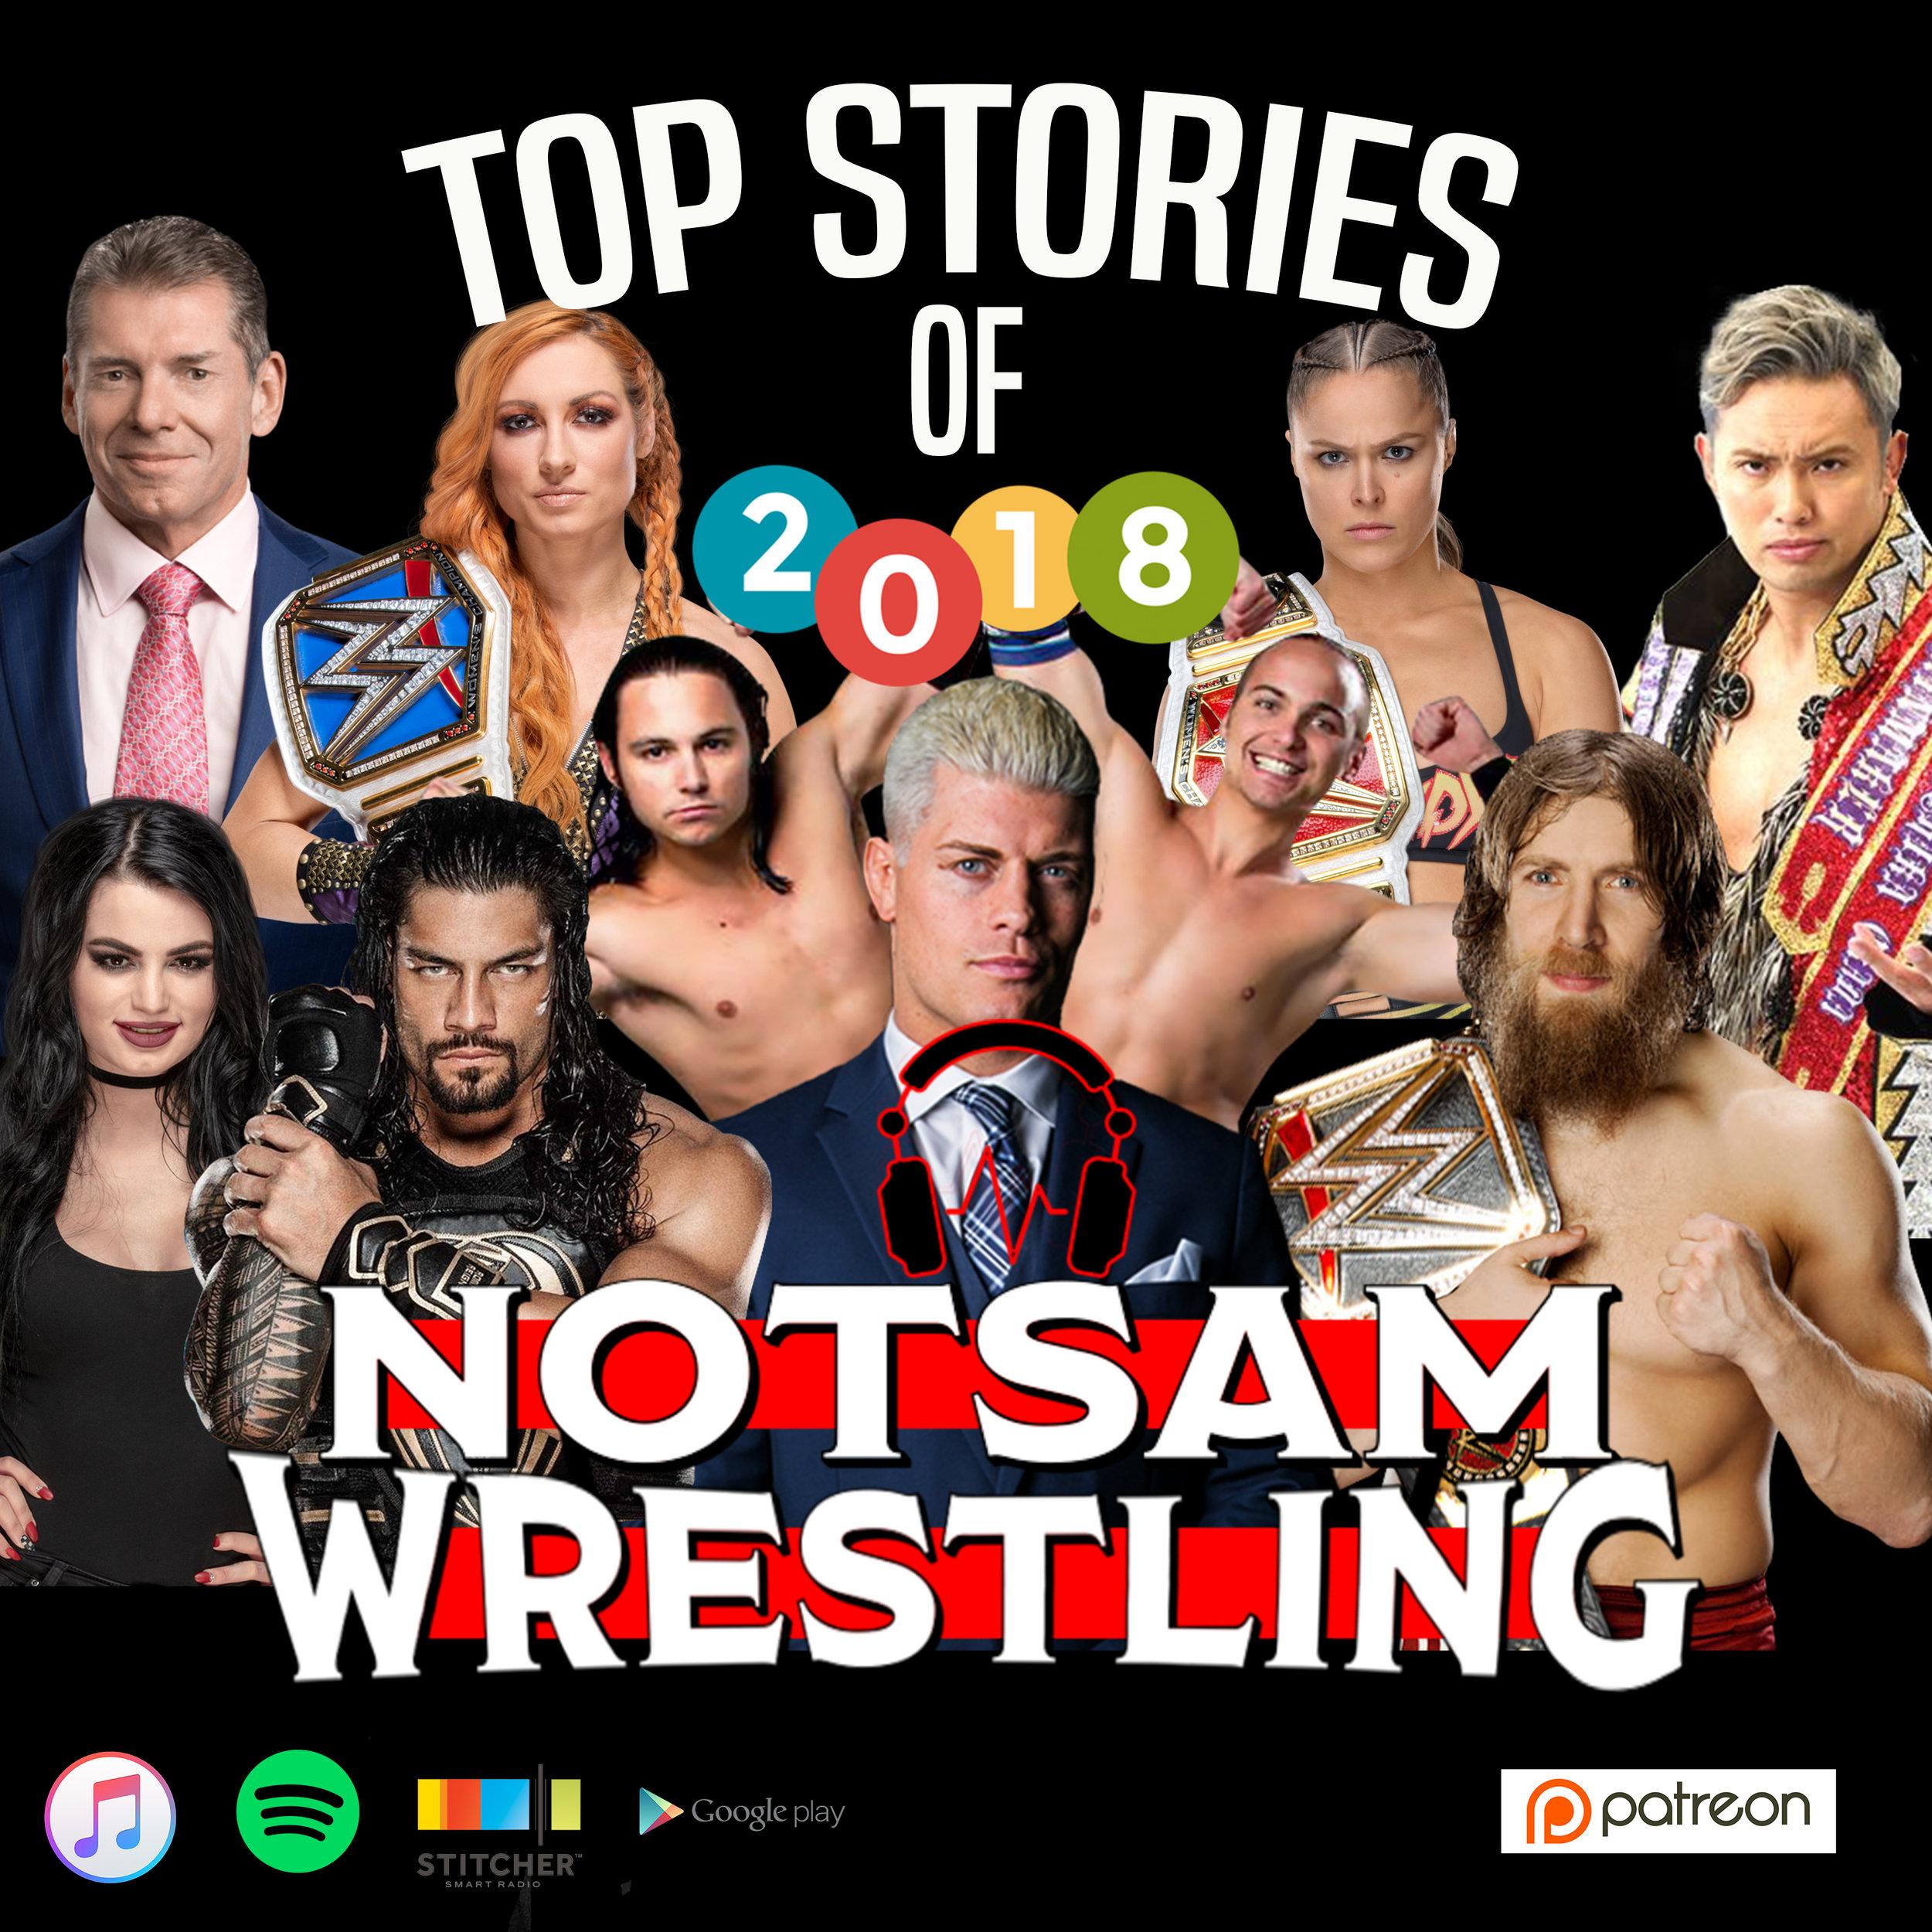 NotsamWrestlingTopStories2018.jpg